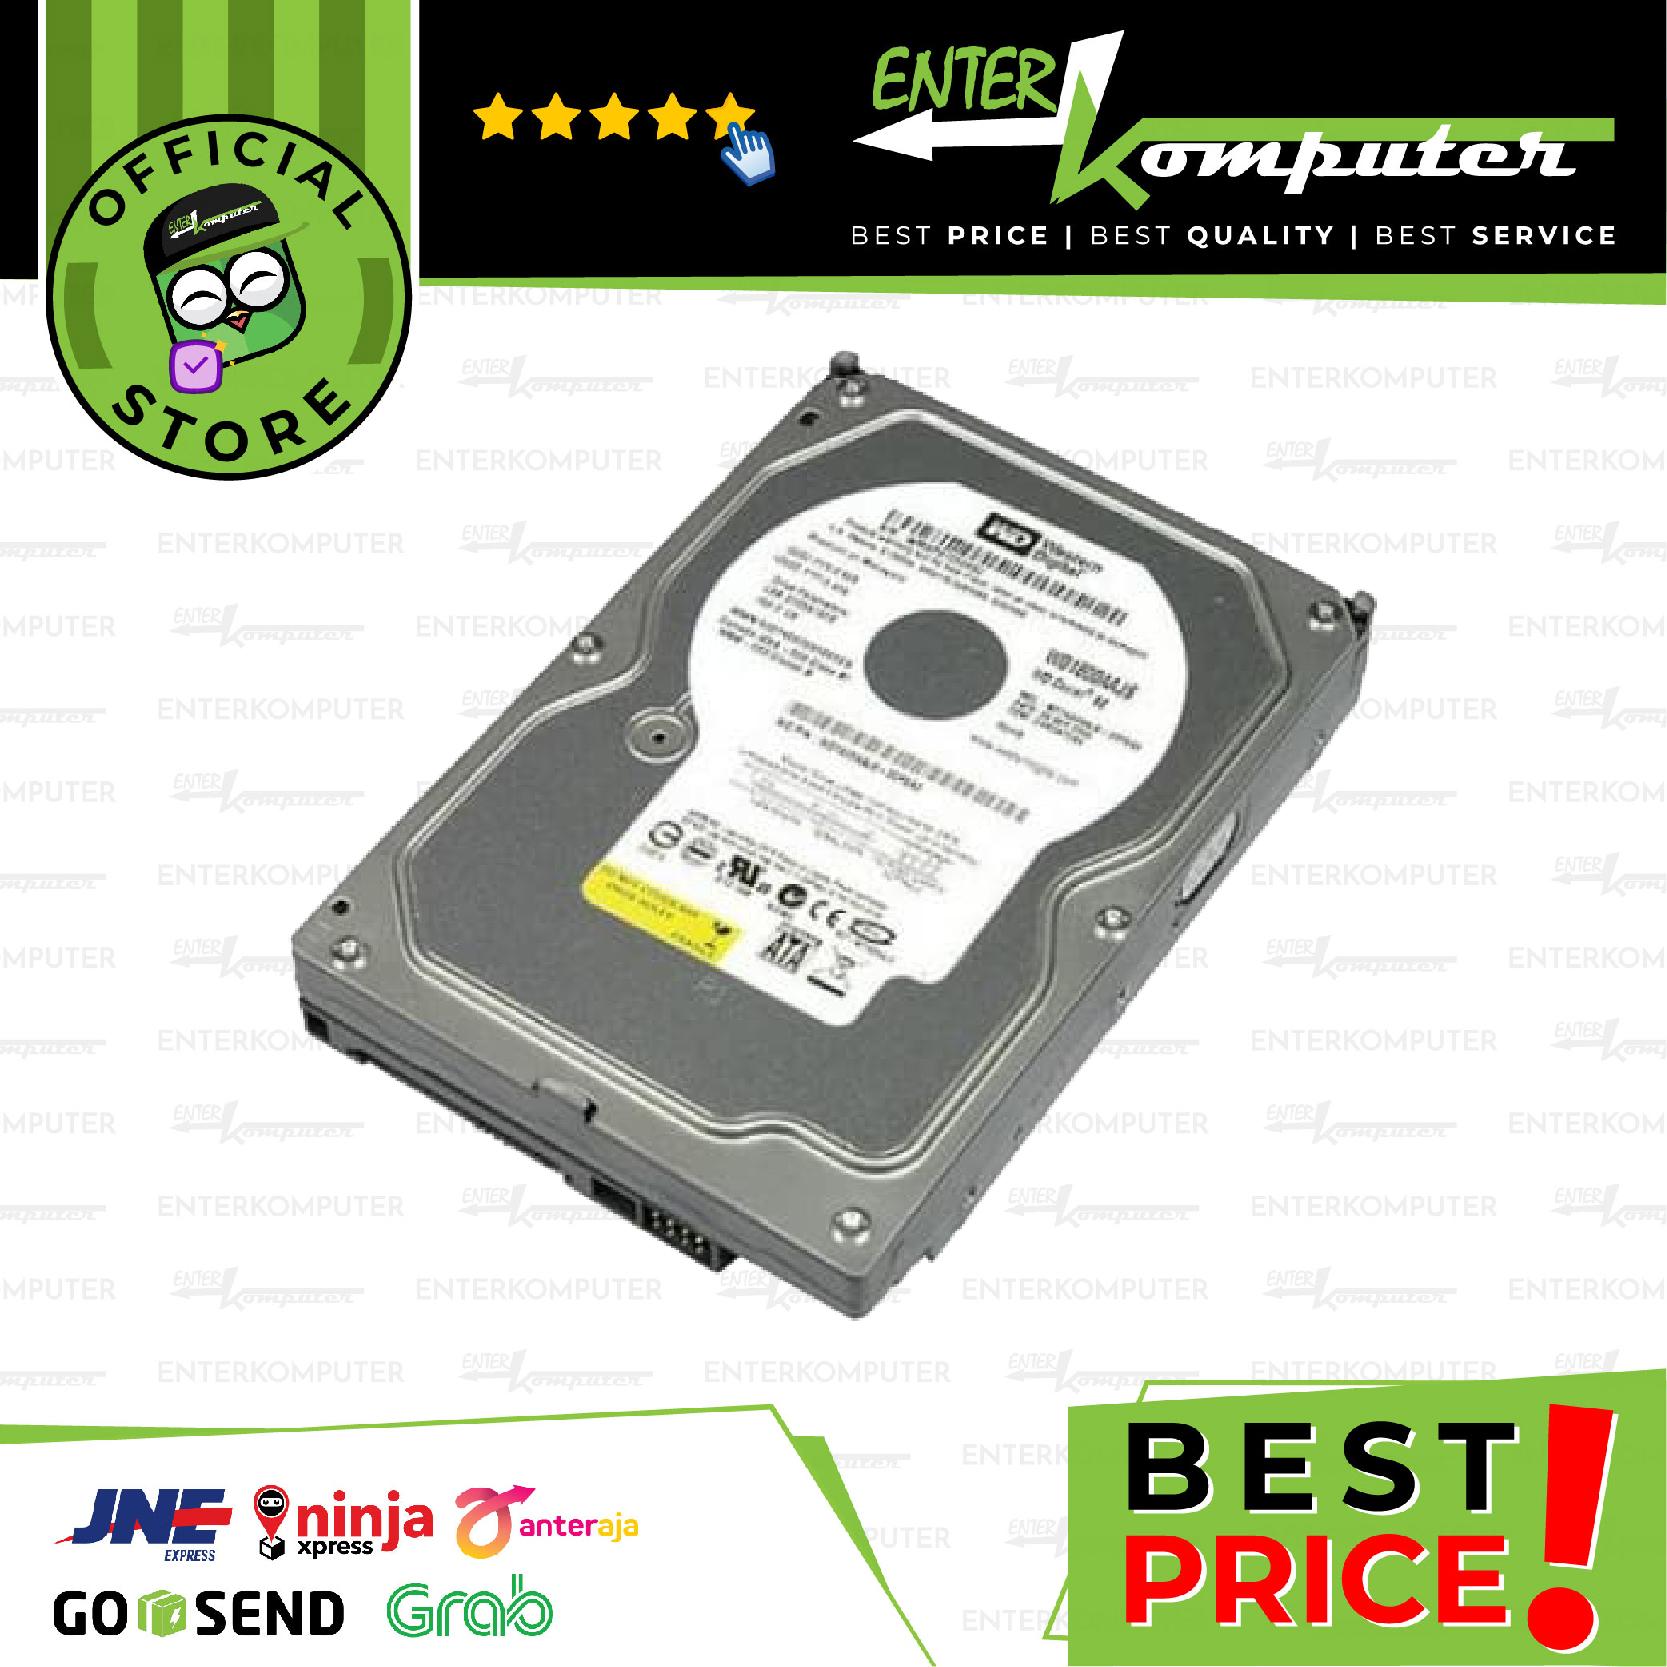 WDC 160GB SATA2 - Used & Garansi 1 Tahun